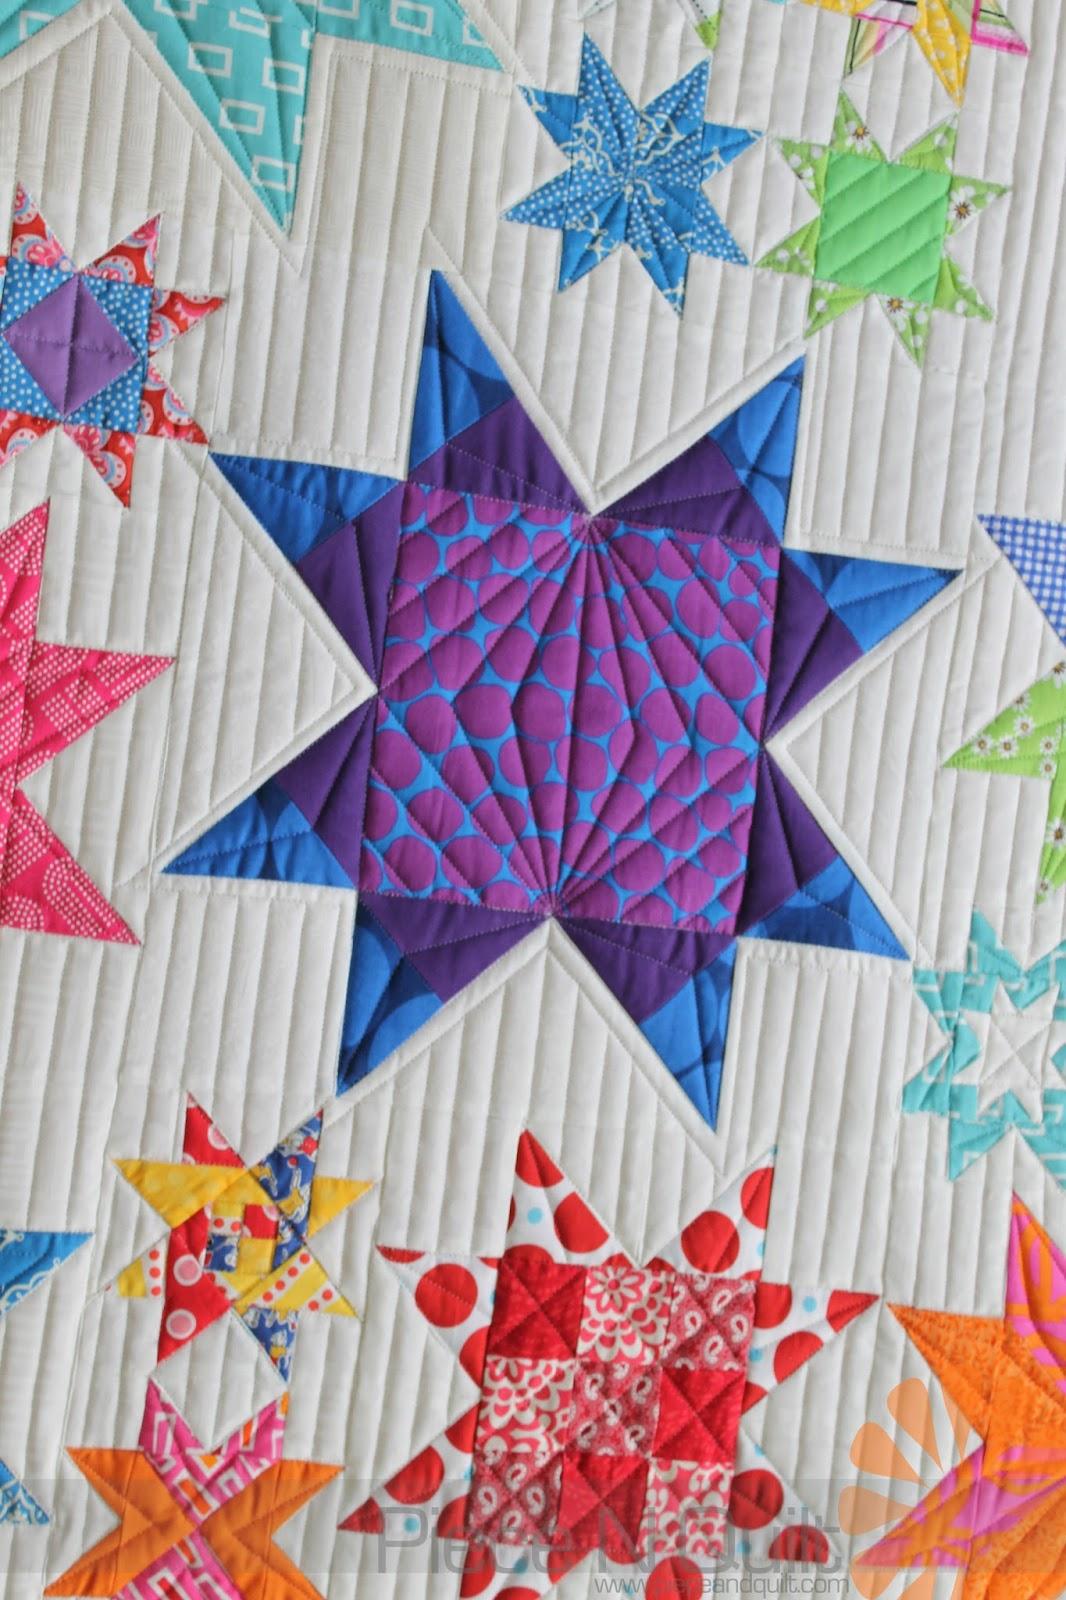 Piece N Quilt: Modern Star Quilt - Custom Machine Quilting by ... : natalia bonner free motion quilting - Adamdwight.com